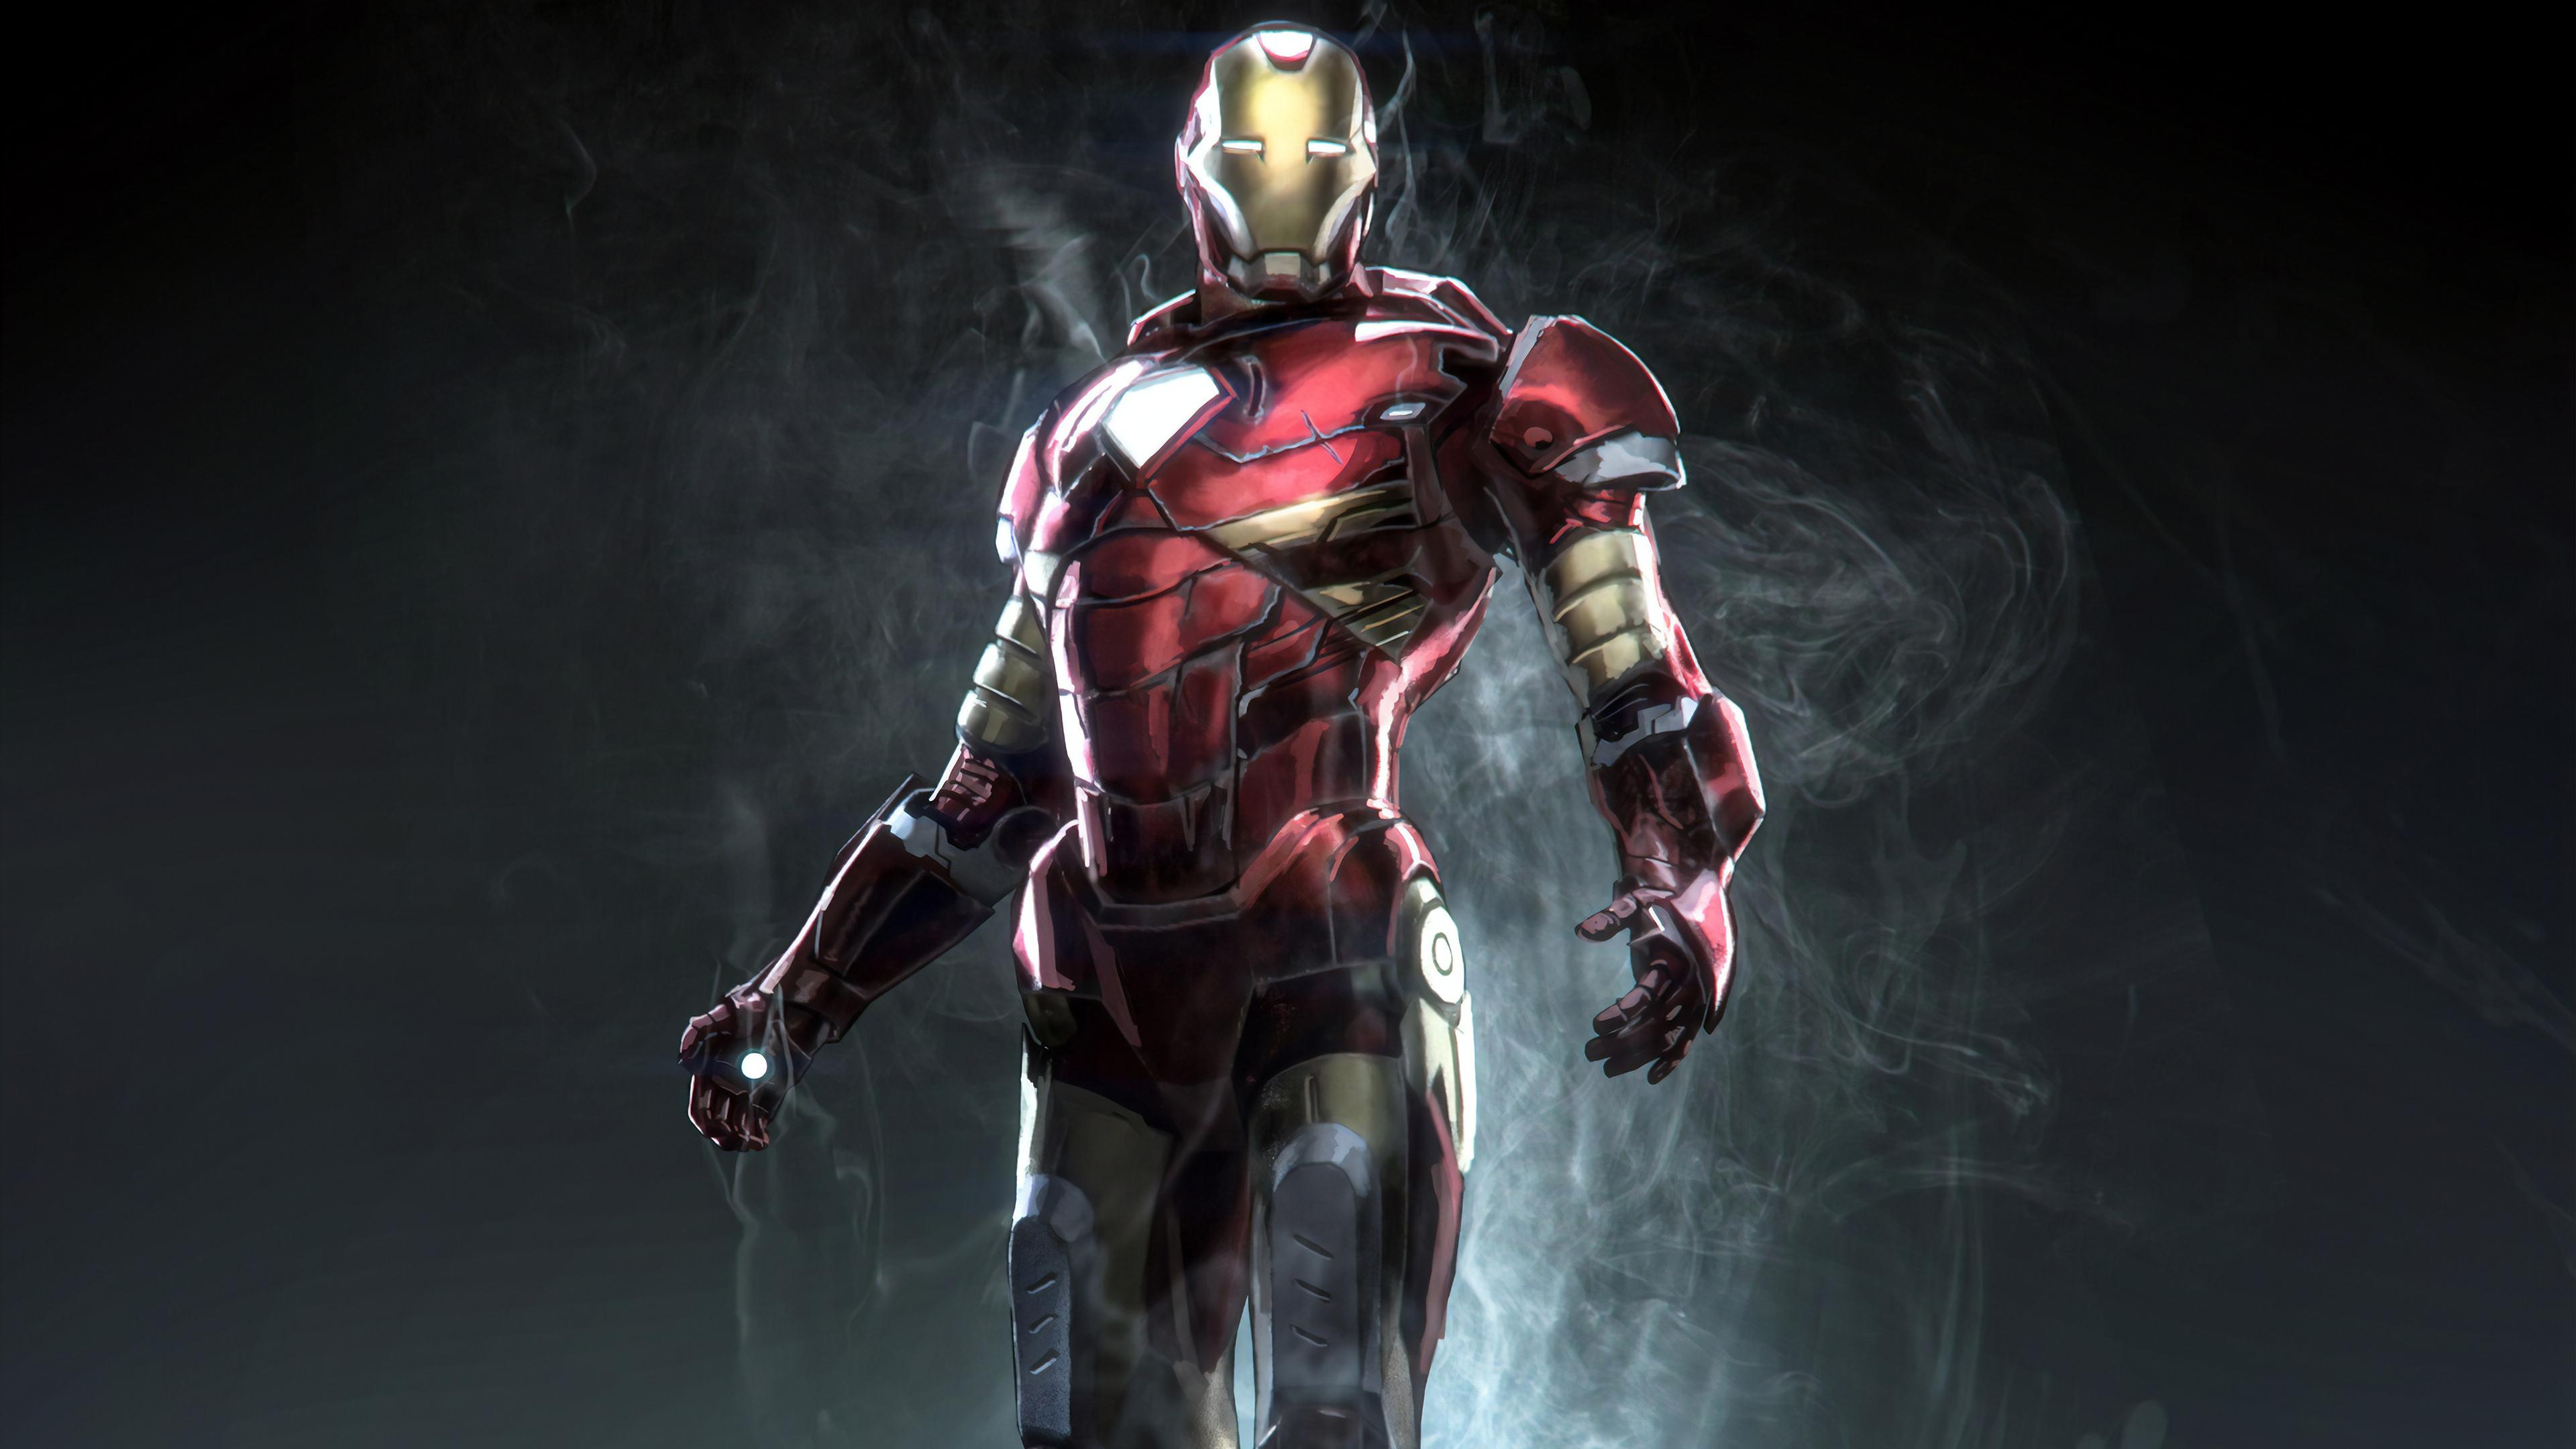 iron man marvel superhero 1565053351 - Iron Man Marvel Superhero - superheroes wallpapers, marvel wallpapers, iron man wallpapers, hd-wallpapers, artstation wallpapers, 4k-wallpapers